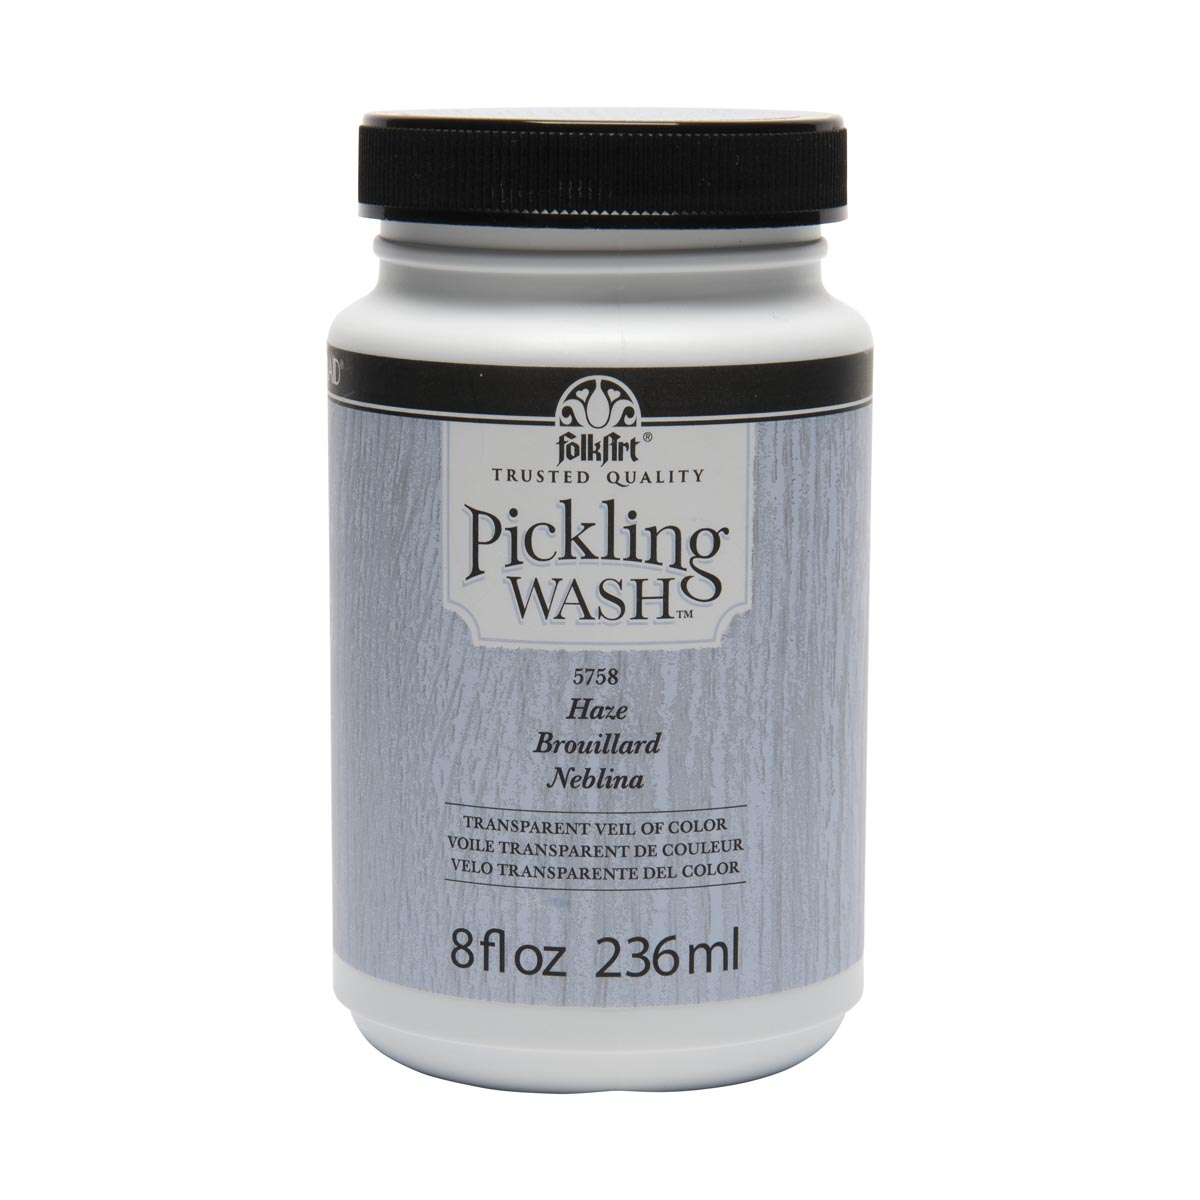 FolkArt ® Pickling Wash™ - Haze, 8 oz. - 5758